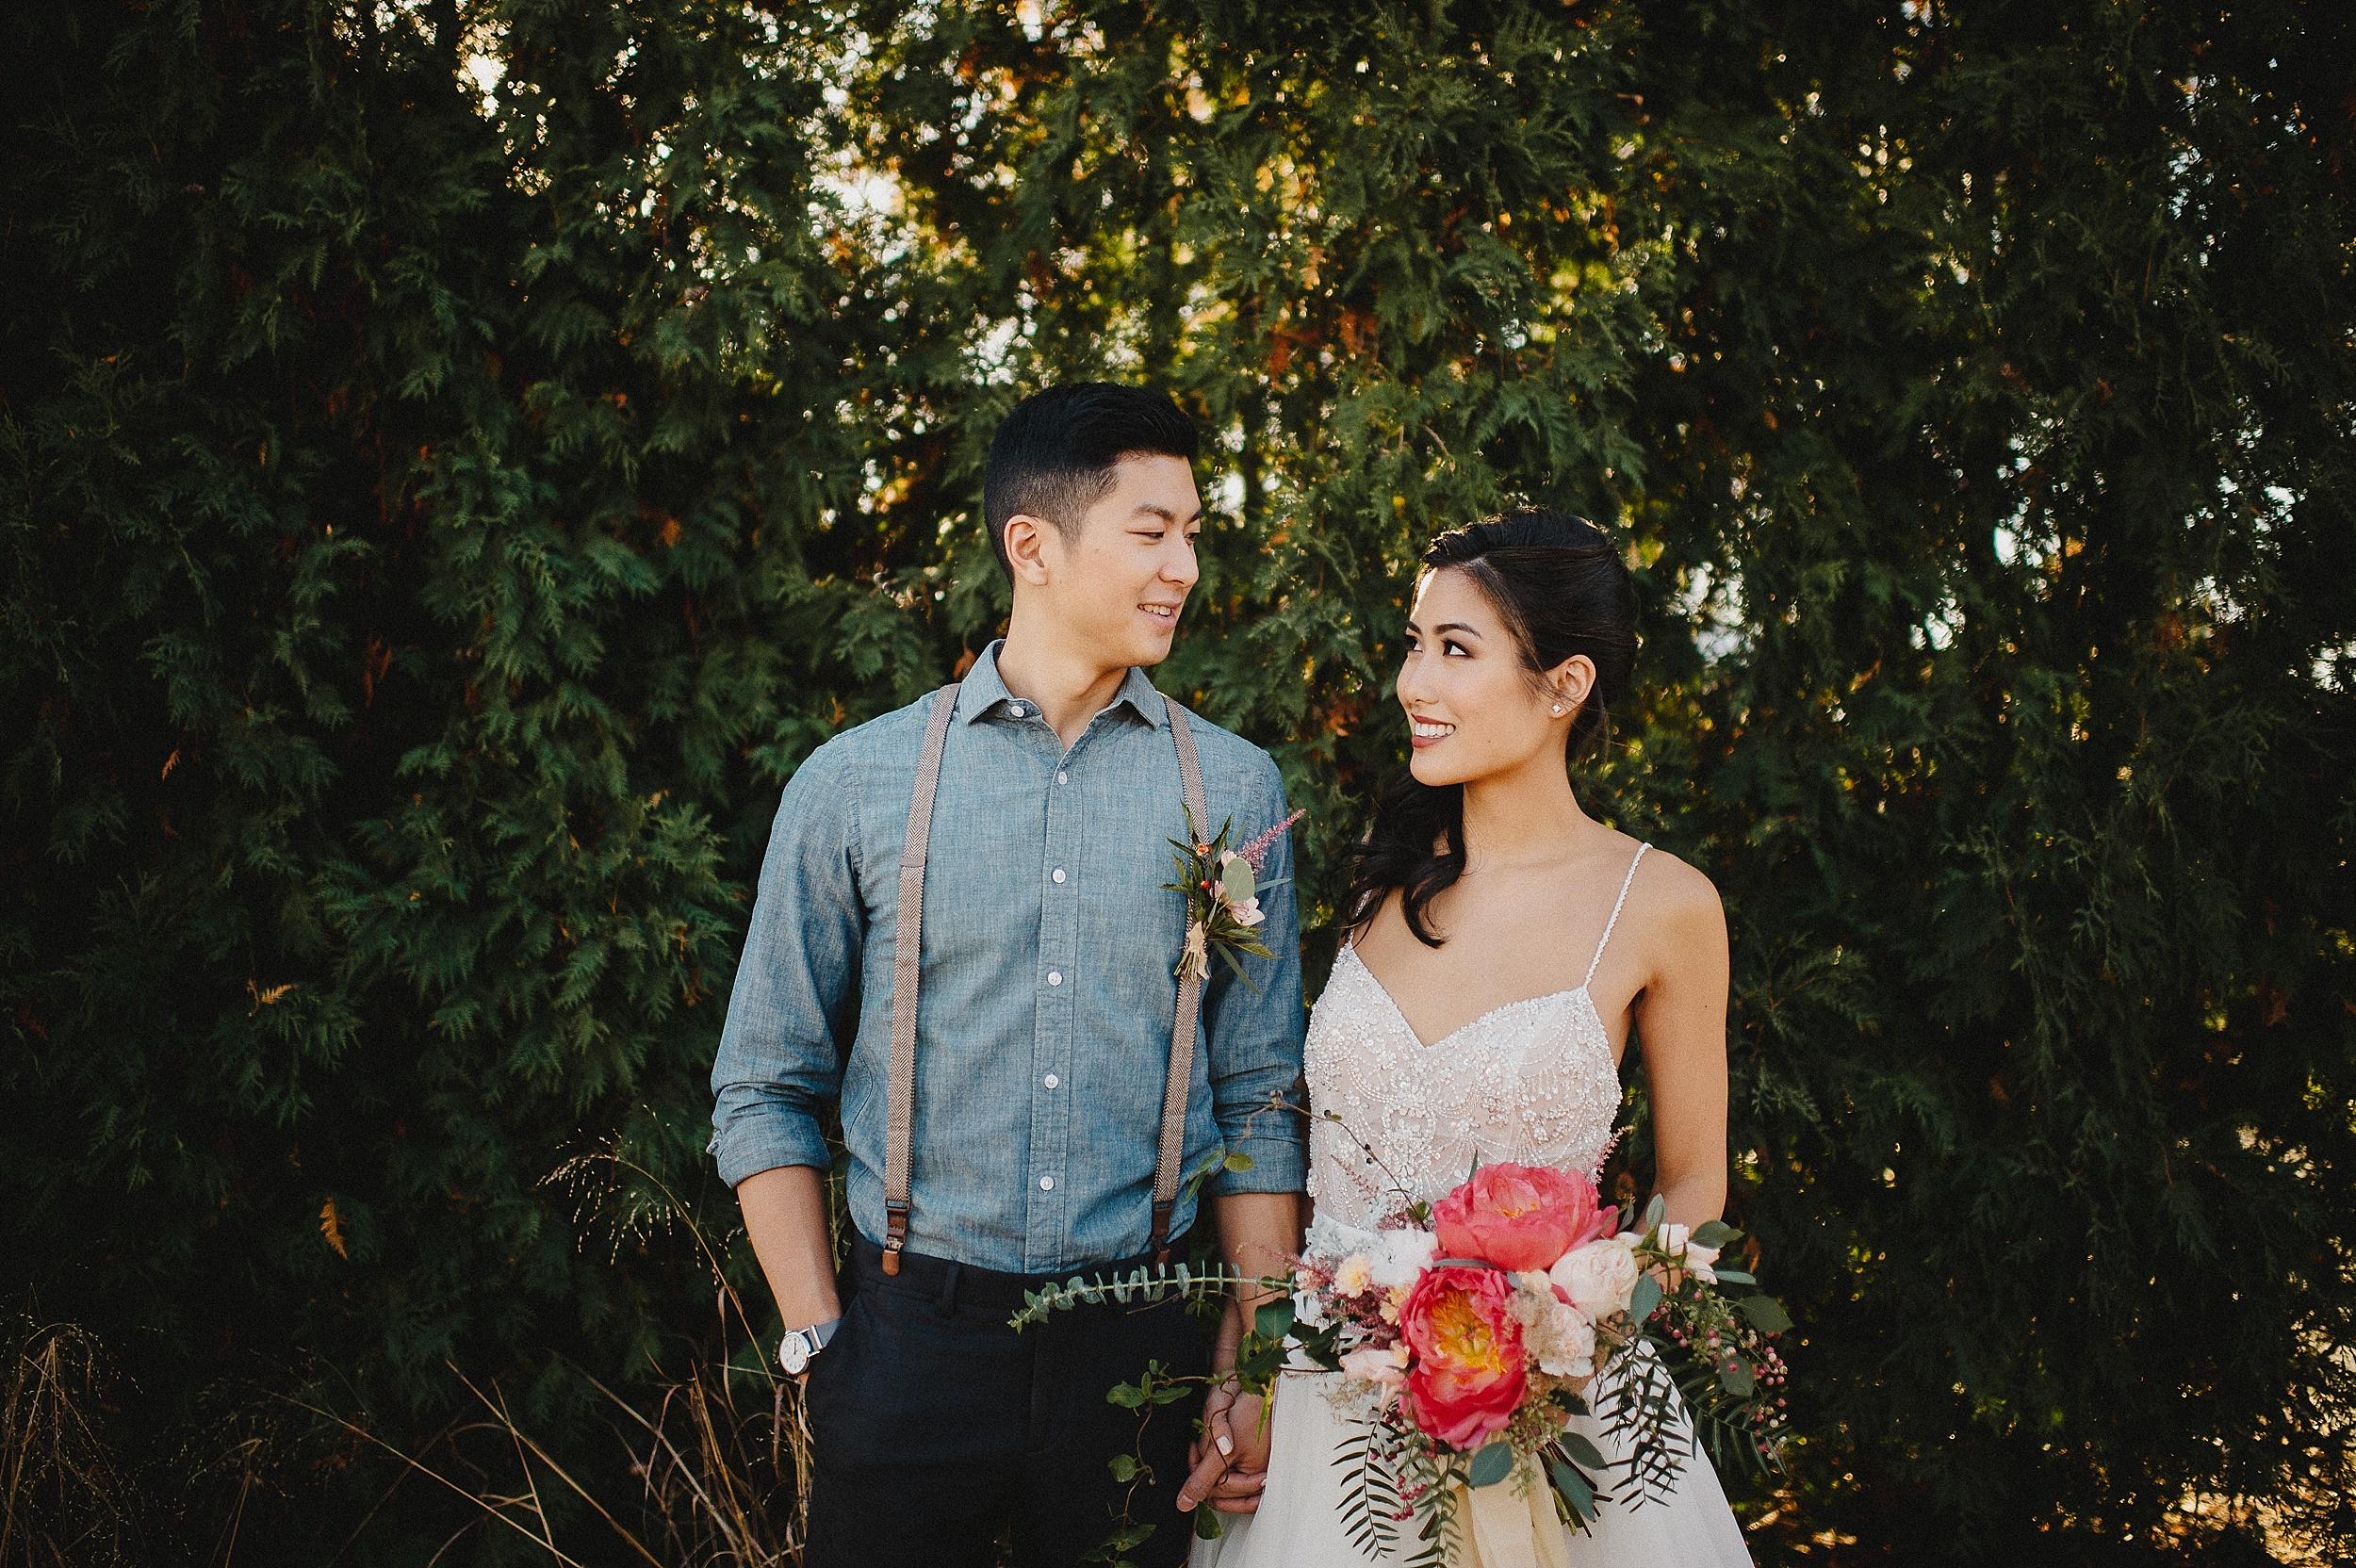 terrain-at-styers-wedding-photography-32.jpg